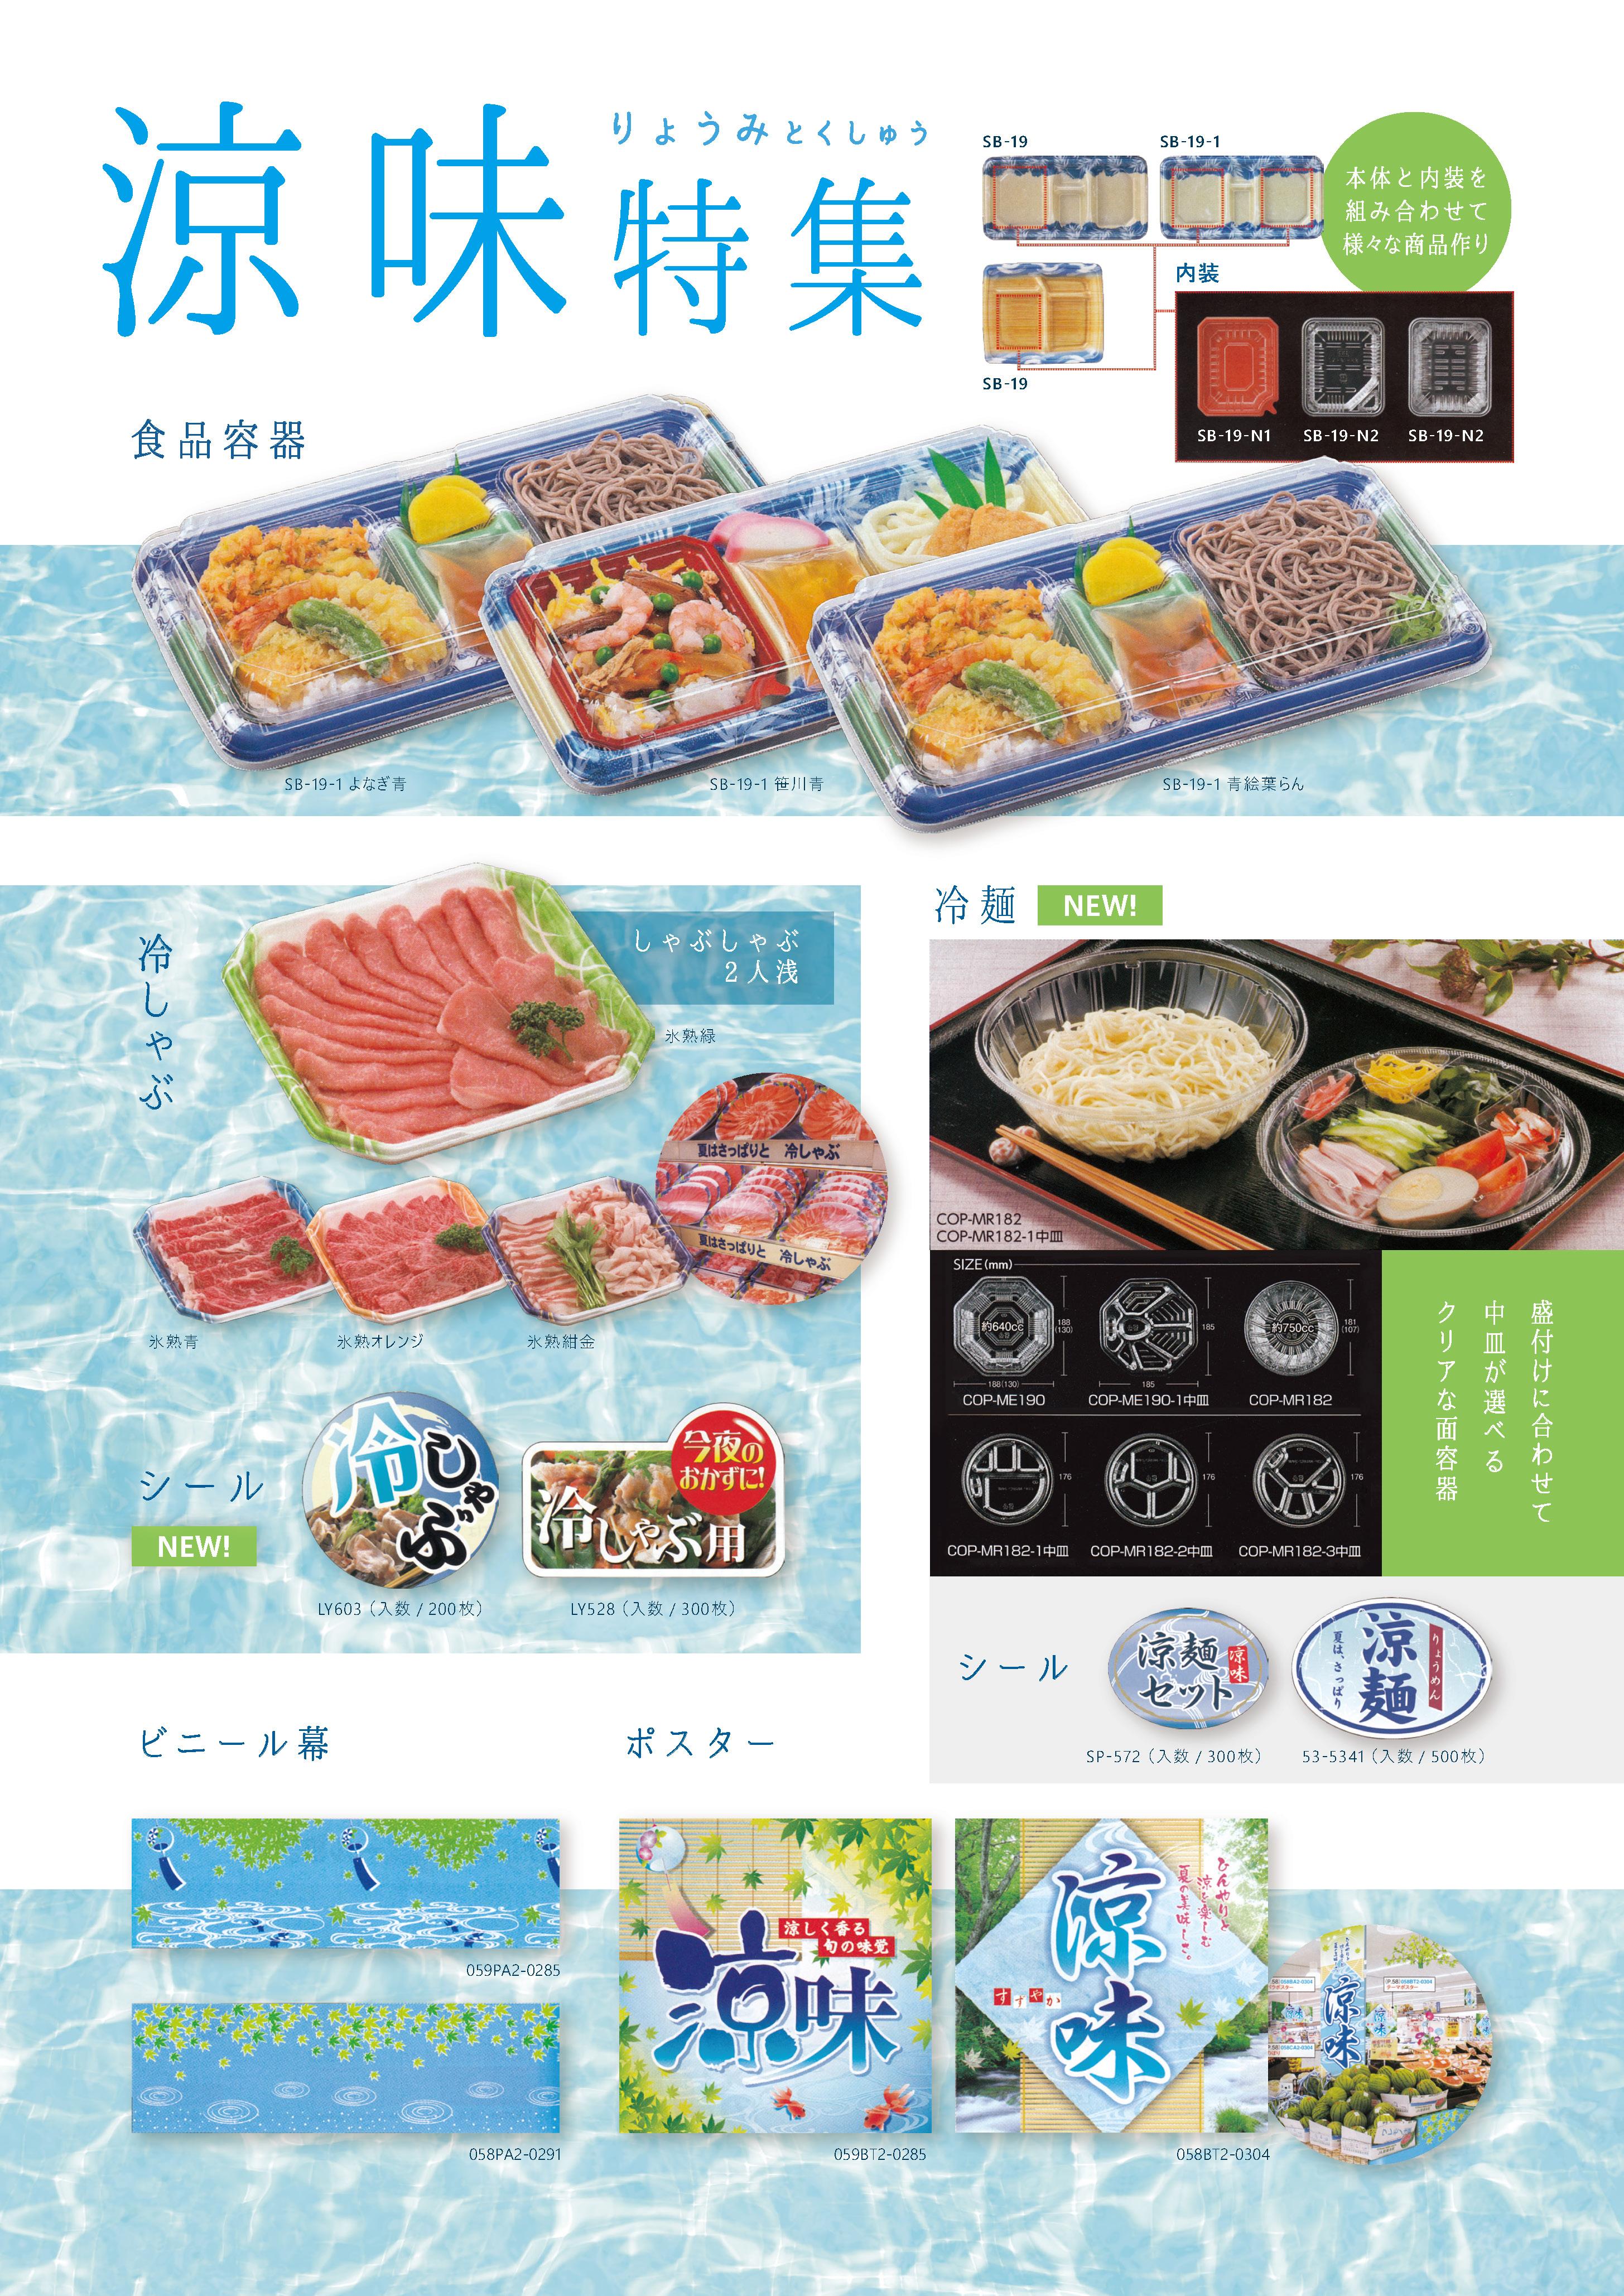 2016年夏の涼味特集